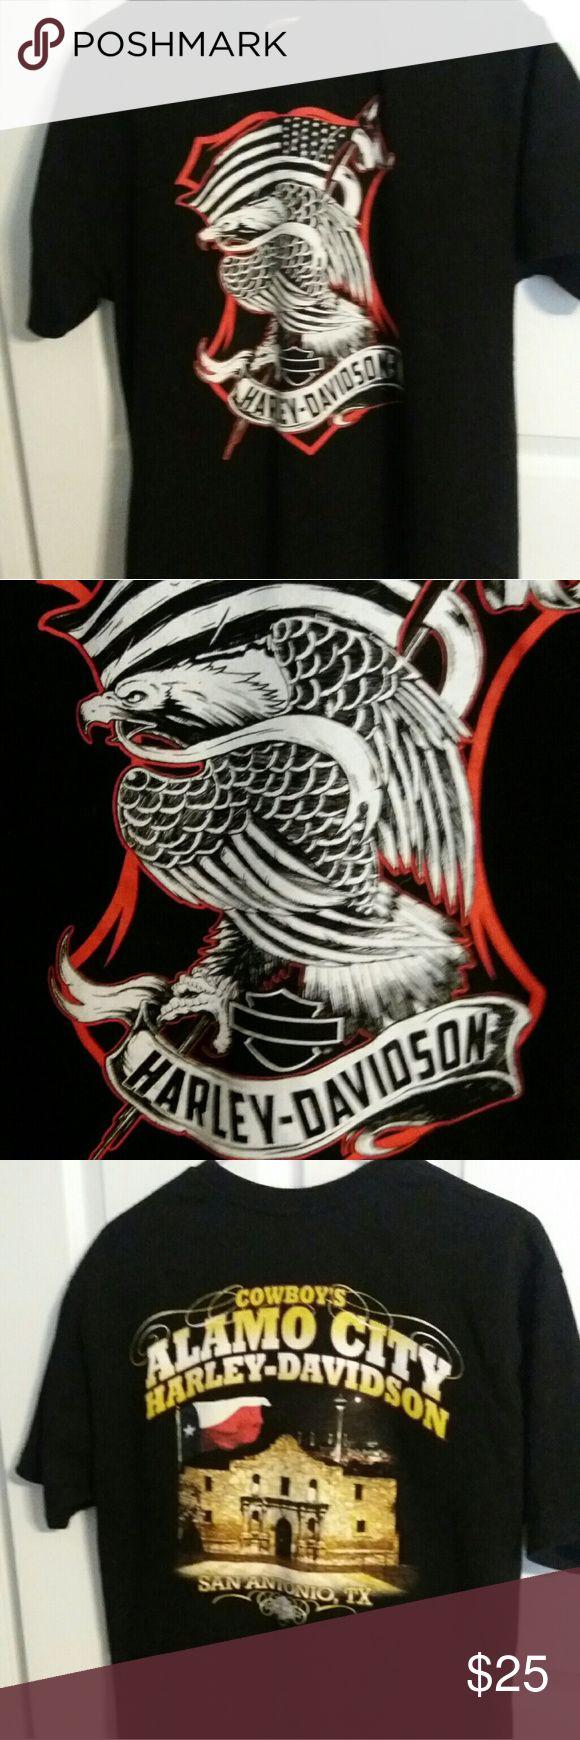 HARLEY DAVIDSON MEN'S T-SHIRT Size Large Black, Alamo City San Antonio, Texas, Good condition,  Size Large Harley-Davidson Shirts Tees - Short Sleeve